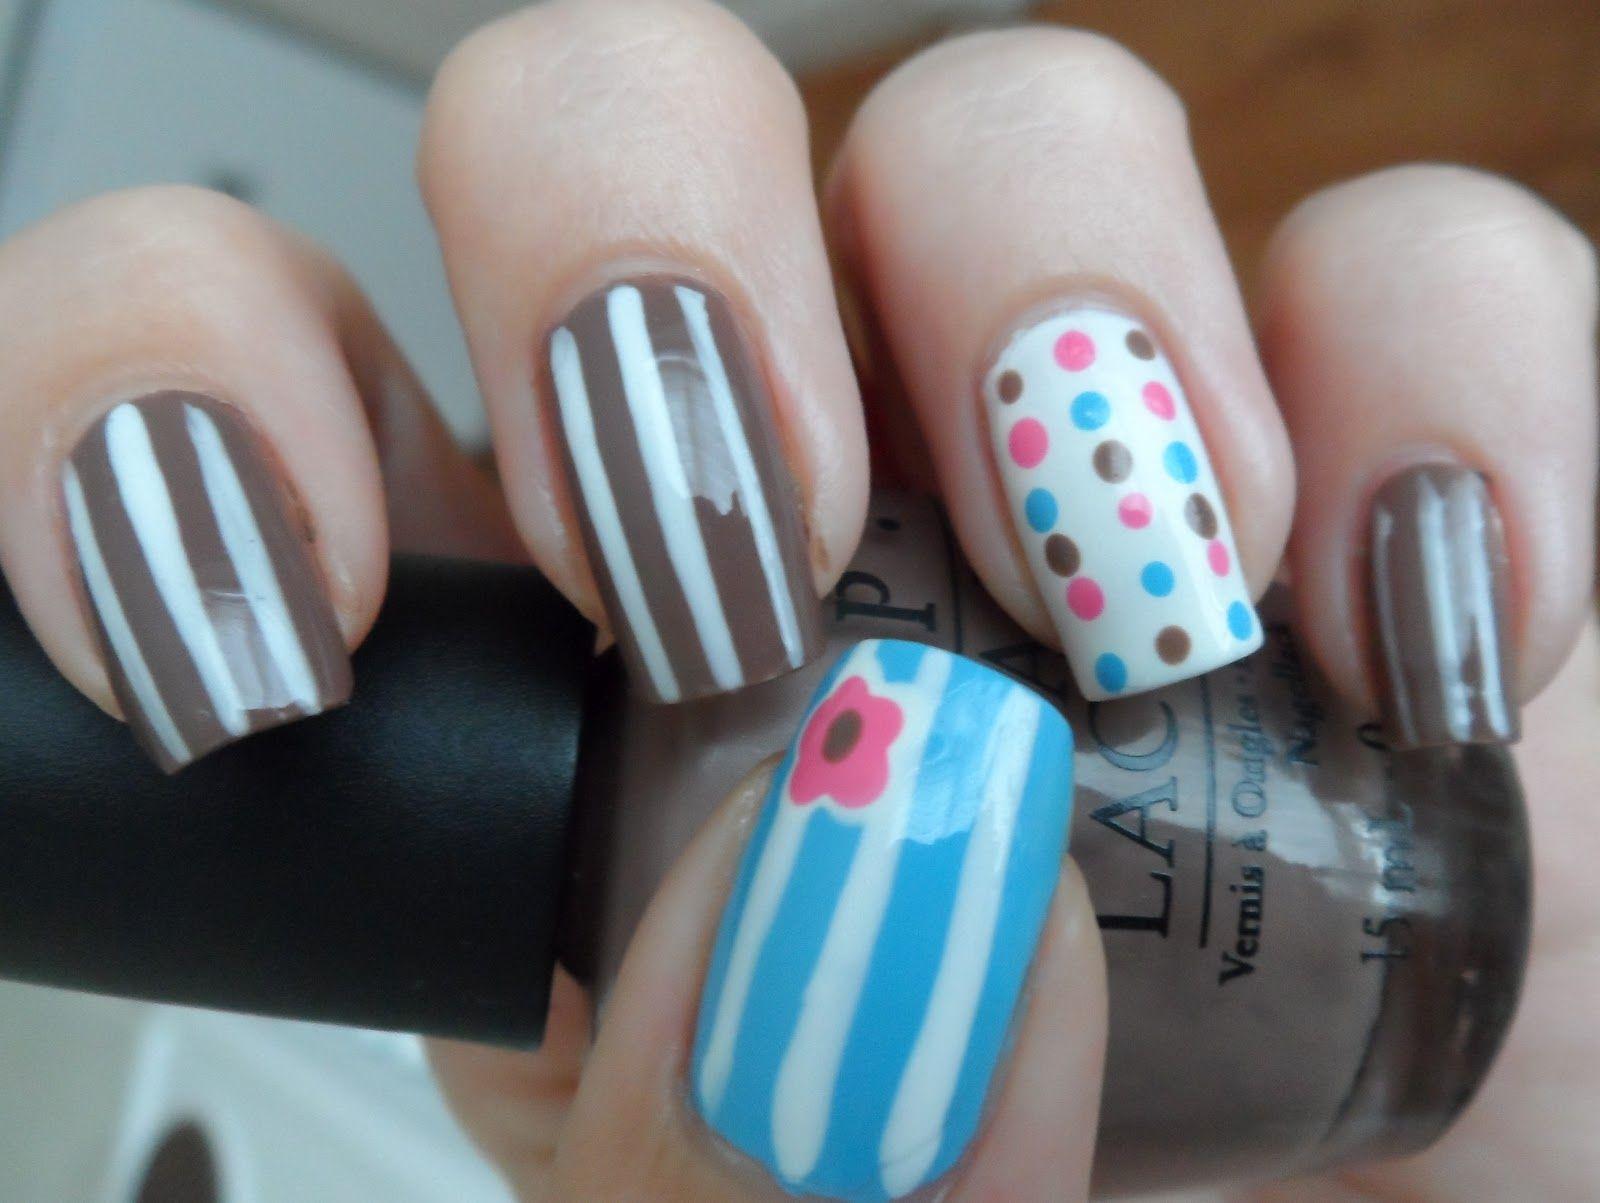 Pin by aquitania leonor on nail art pinterest nail patterns